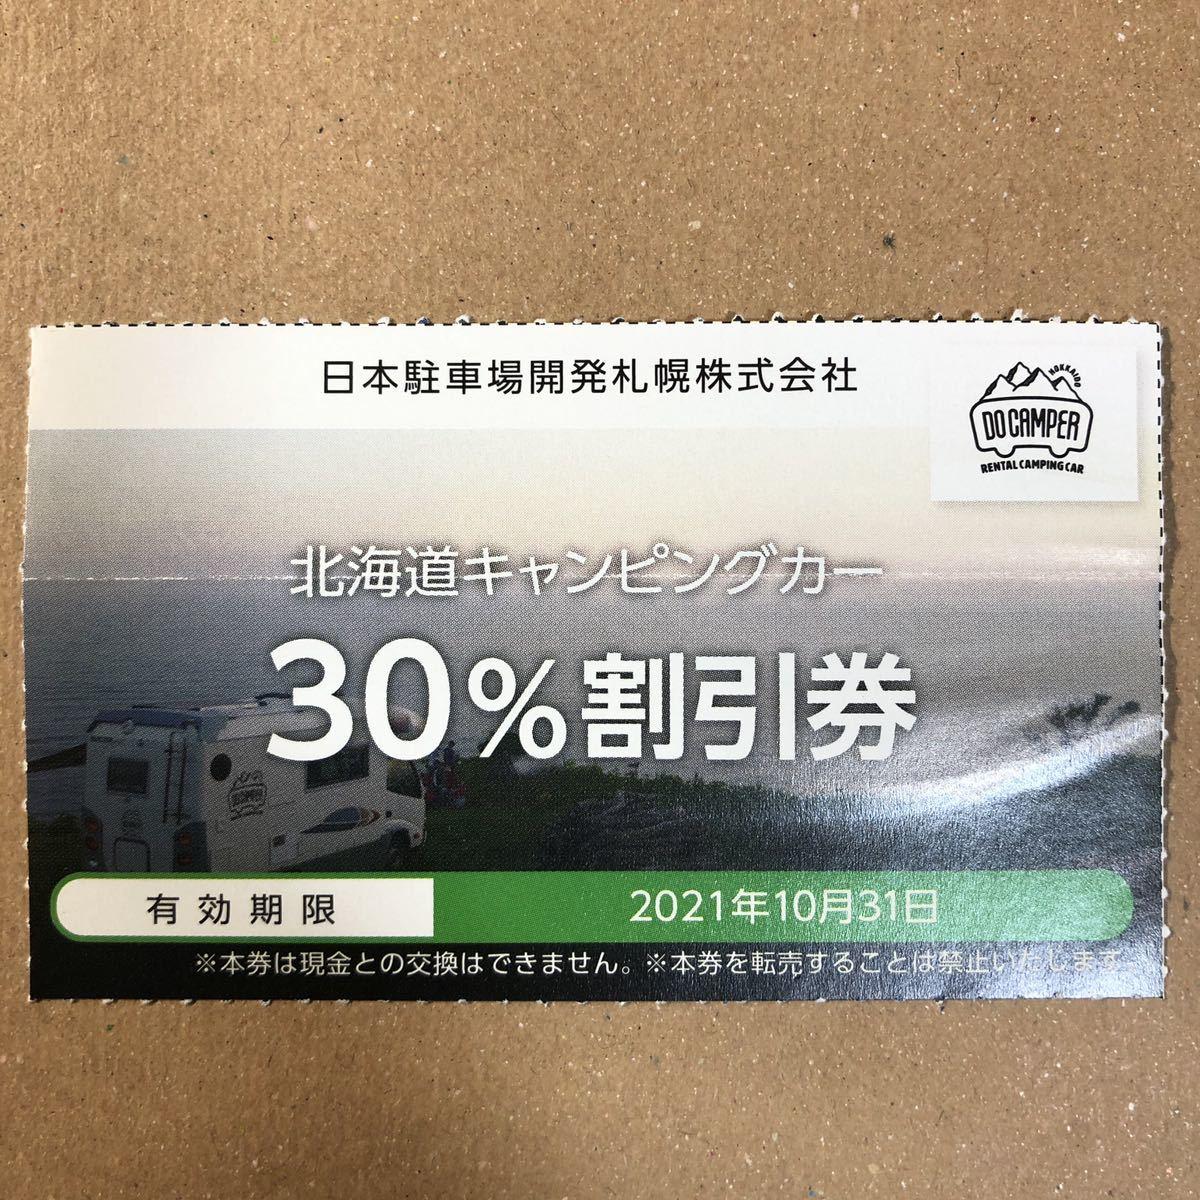 Do Camper 30%割引券 日本駐車場開発 株主優待券 北海道キャンピングカー クーポン券_画像1